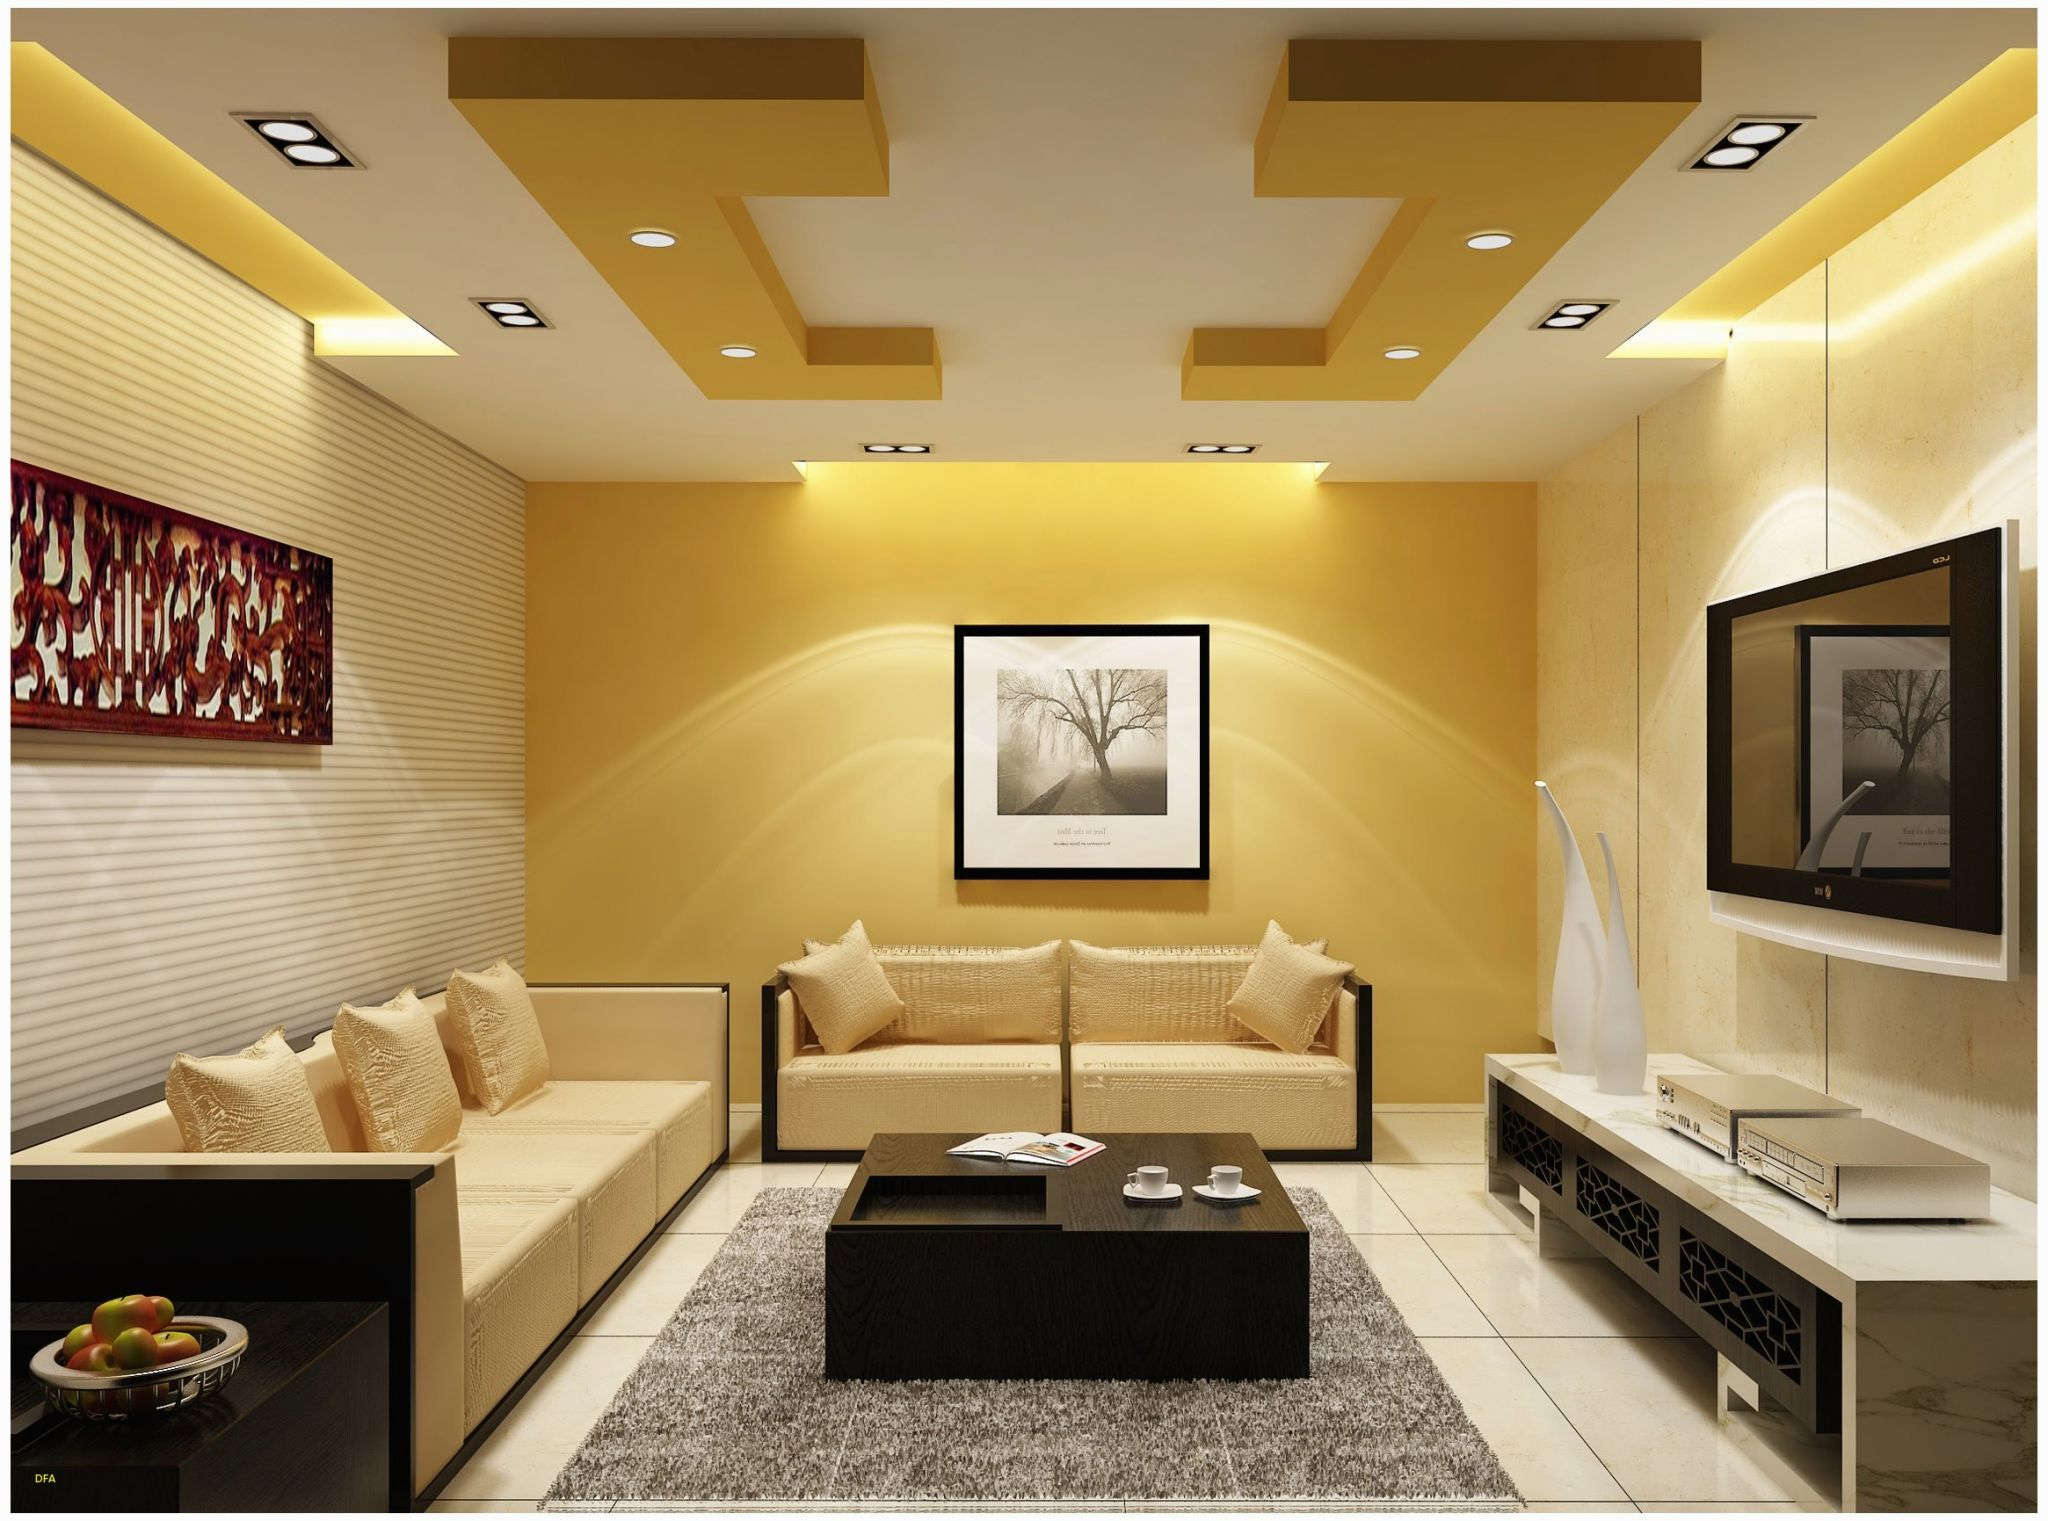 Luxury 10 Living Room Ideas For Fall Season Ceiling Design